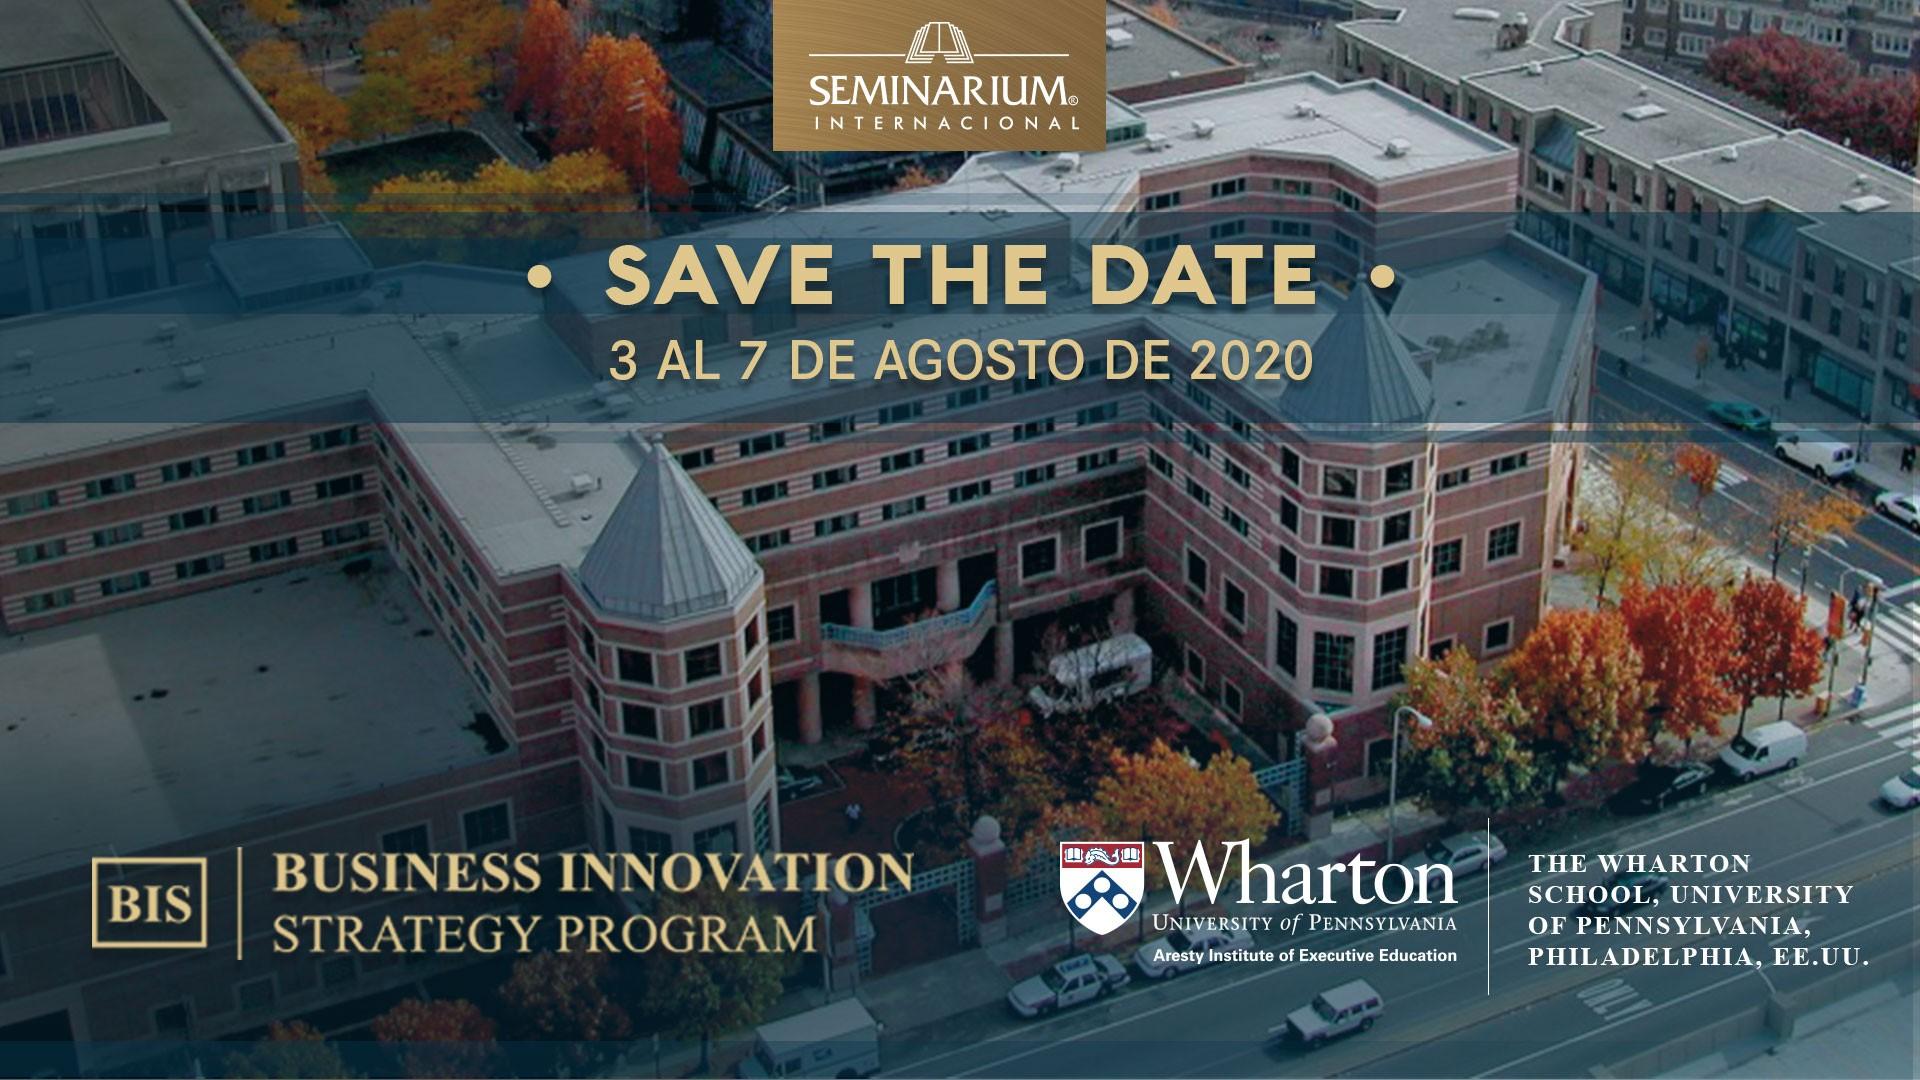 BIS - Business Innovation Strategy Program